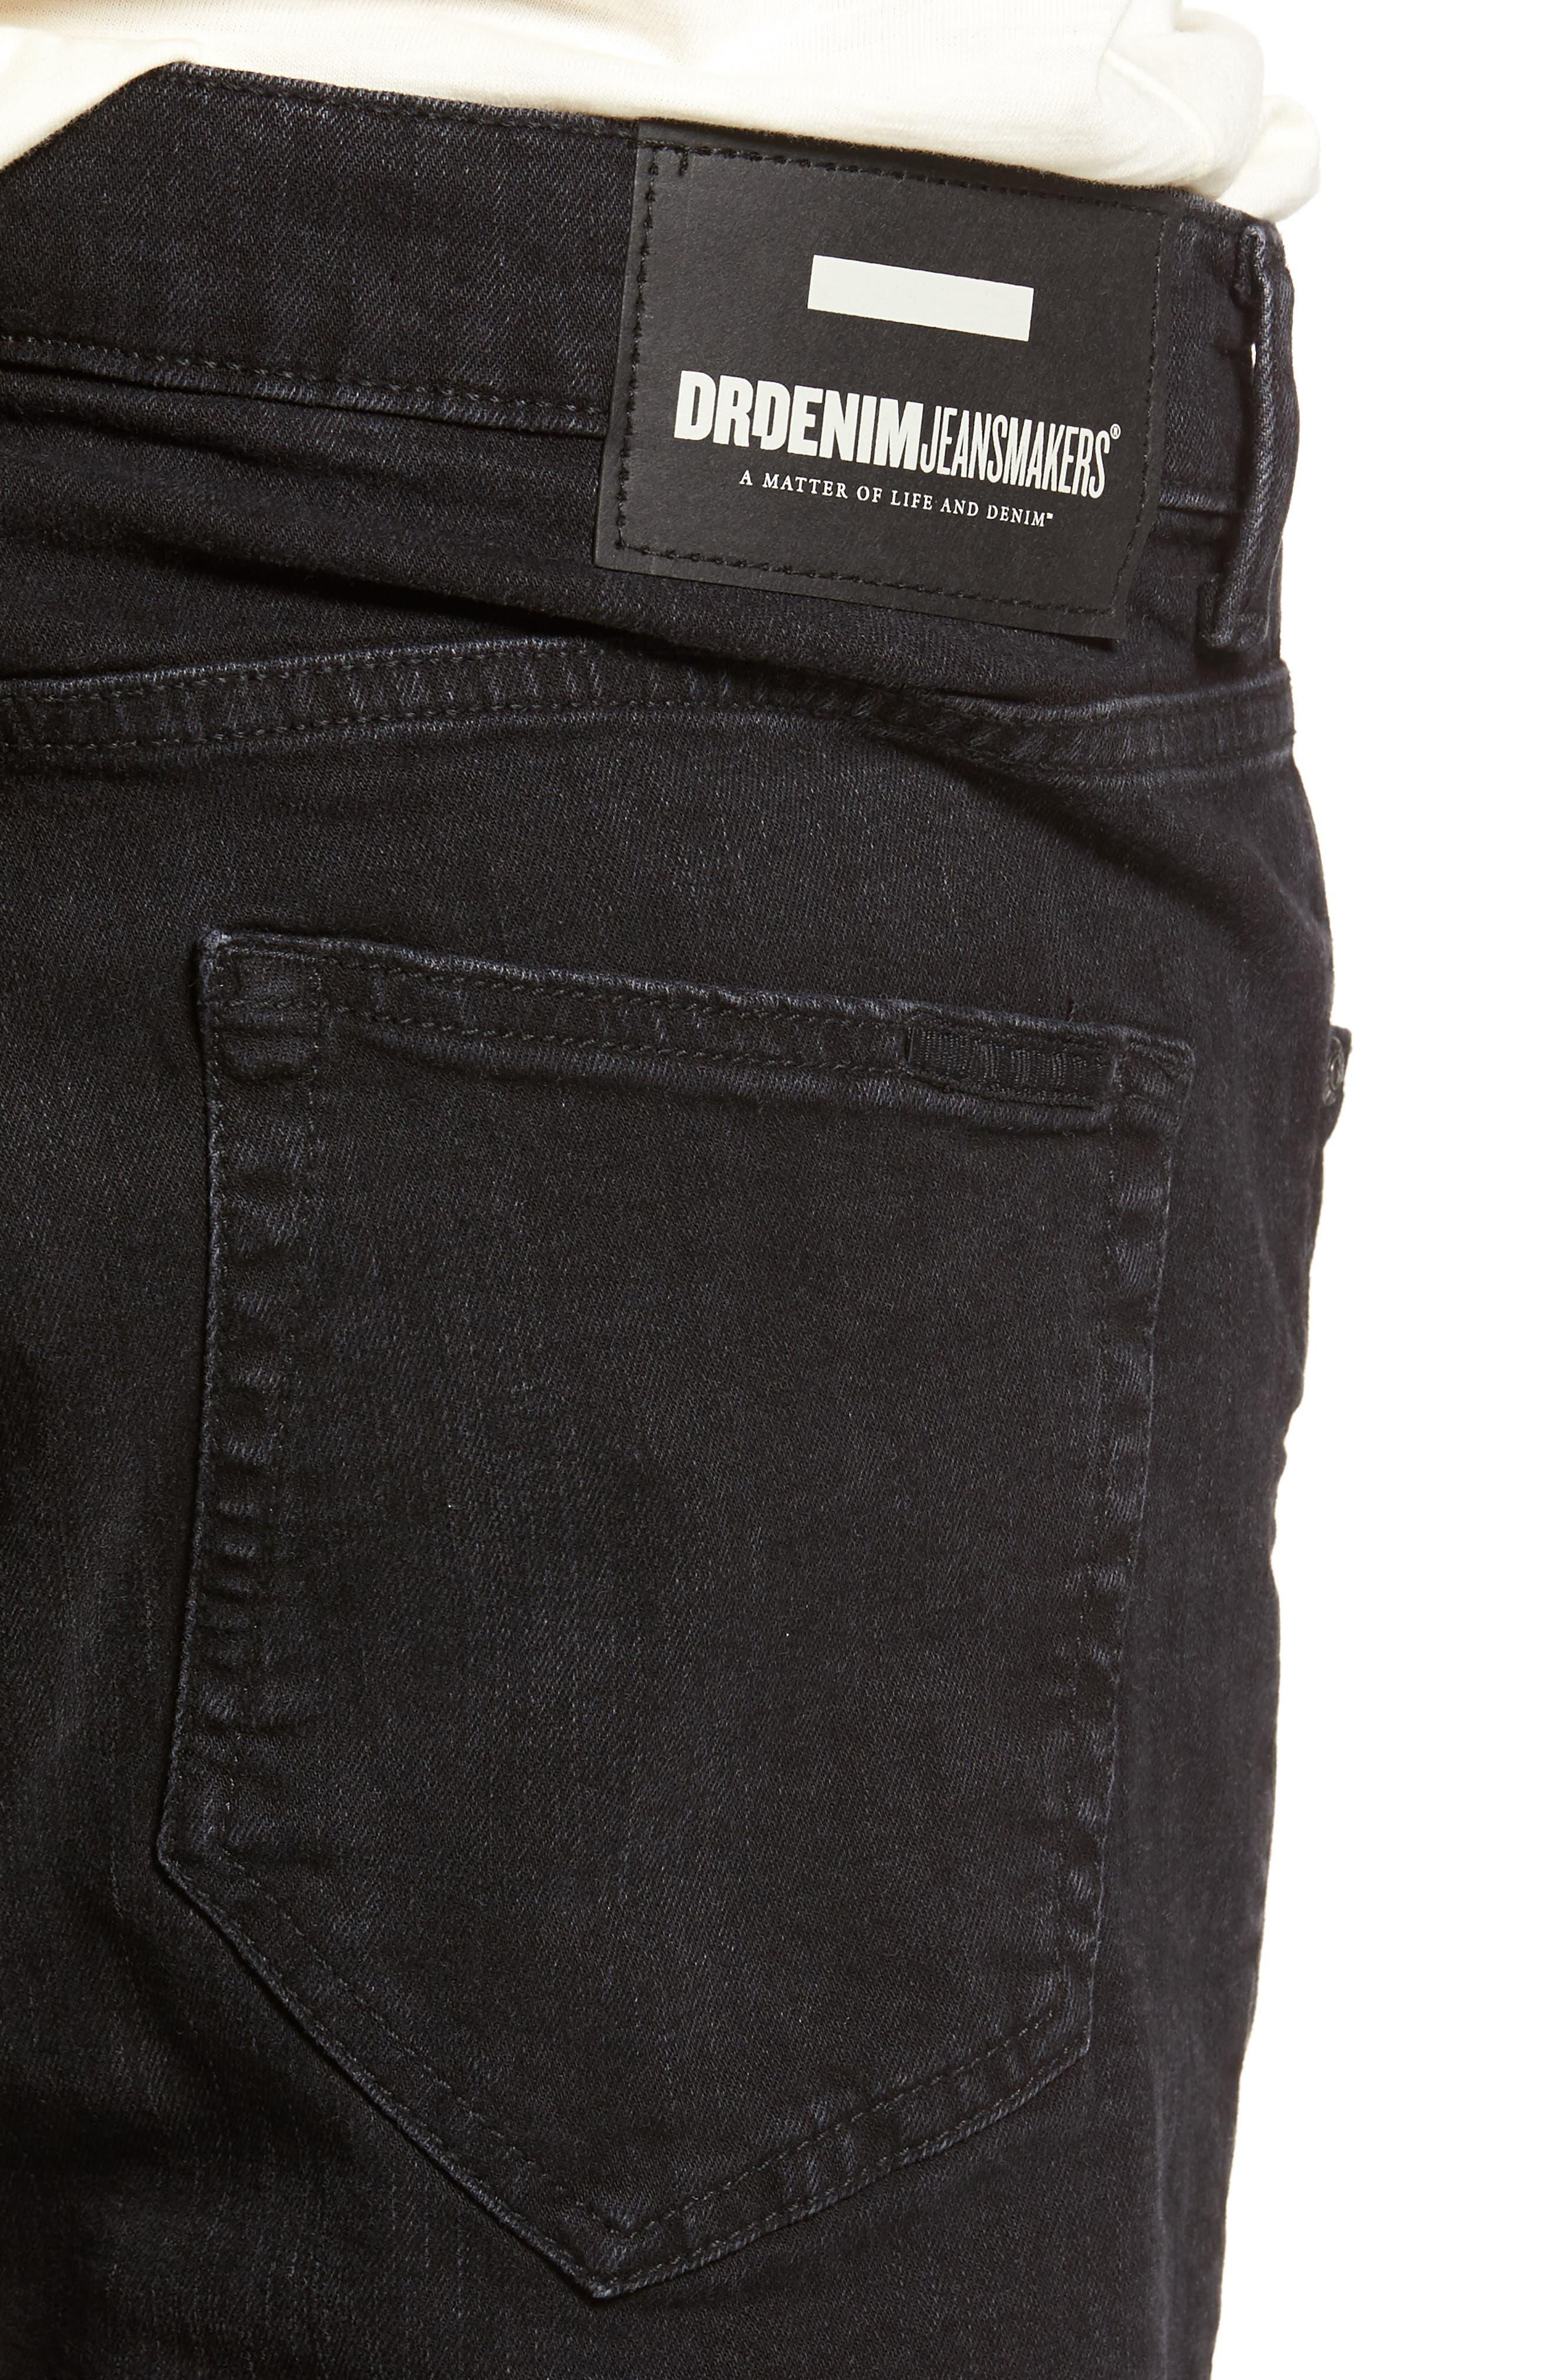 Clark Slim Straight Leg Jeans,                             Alternate thumbnail 4, color,                             Organic Worn Black